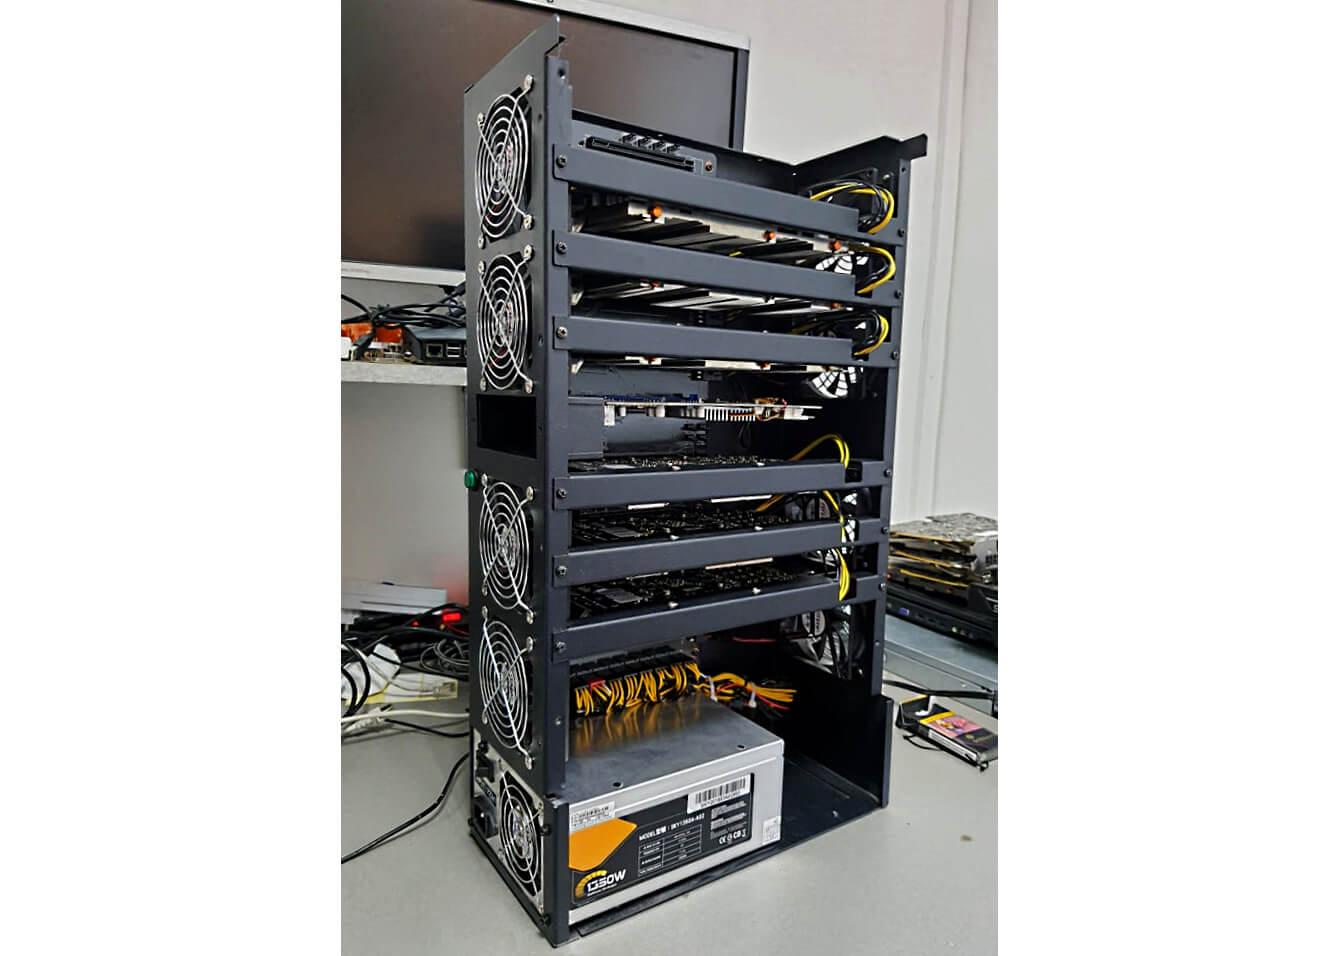 Mašina na kryptomeny - stroj na ťažbu Bitcoinu, Ethereum, Zcash, Monero..1web